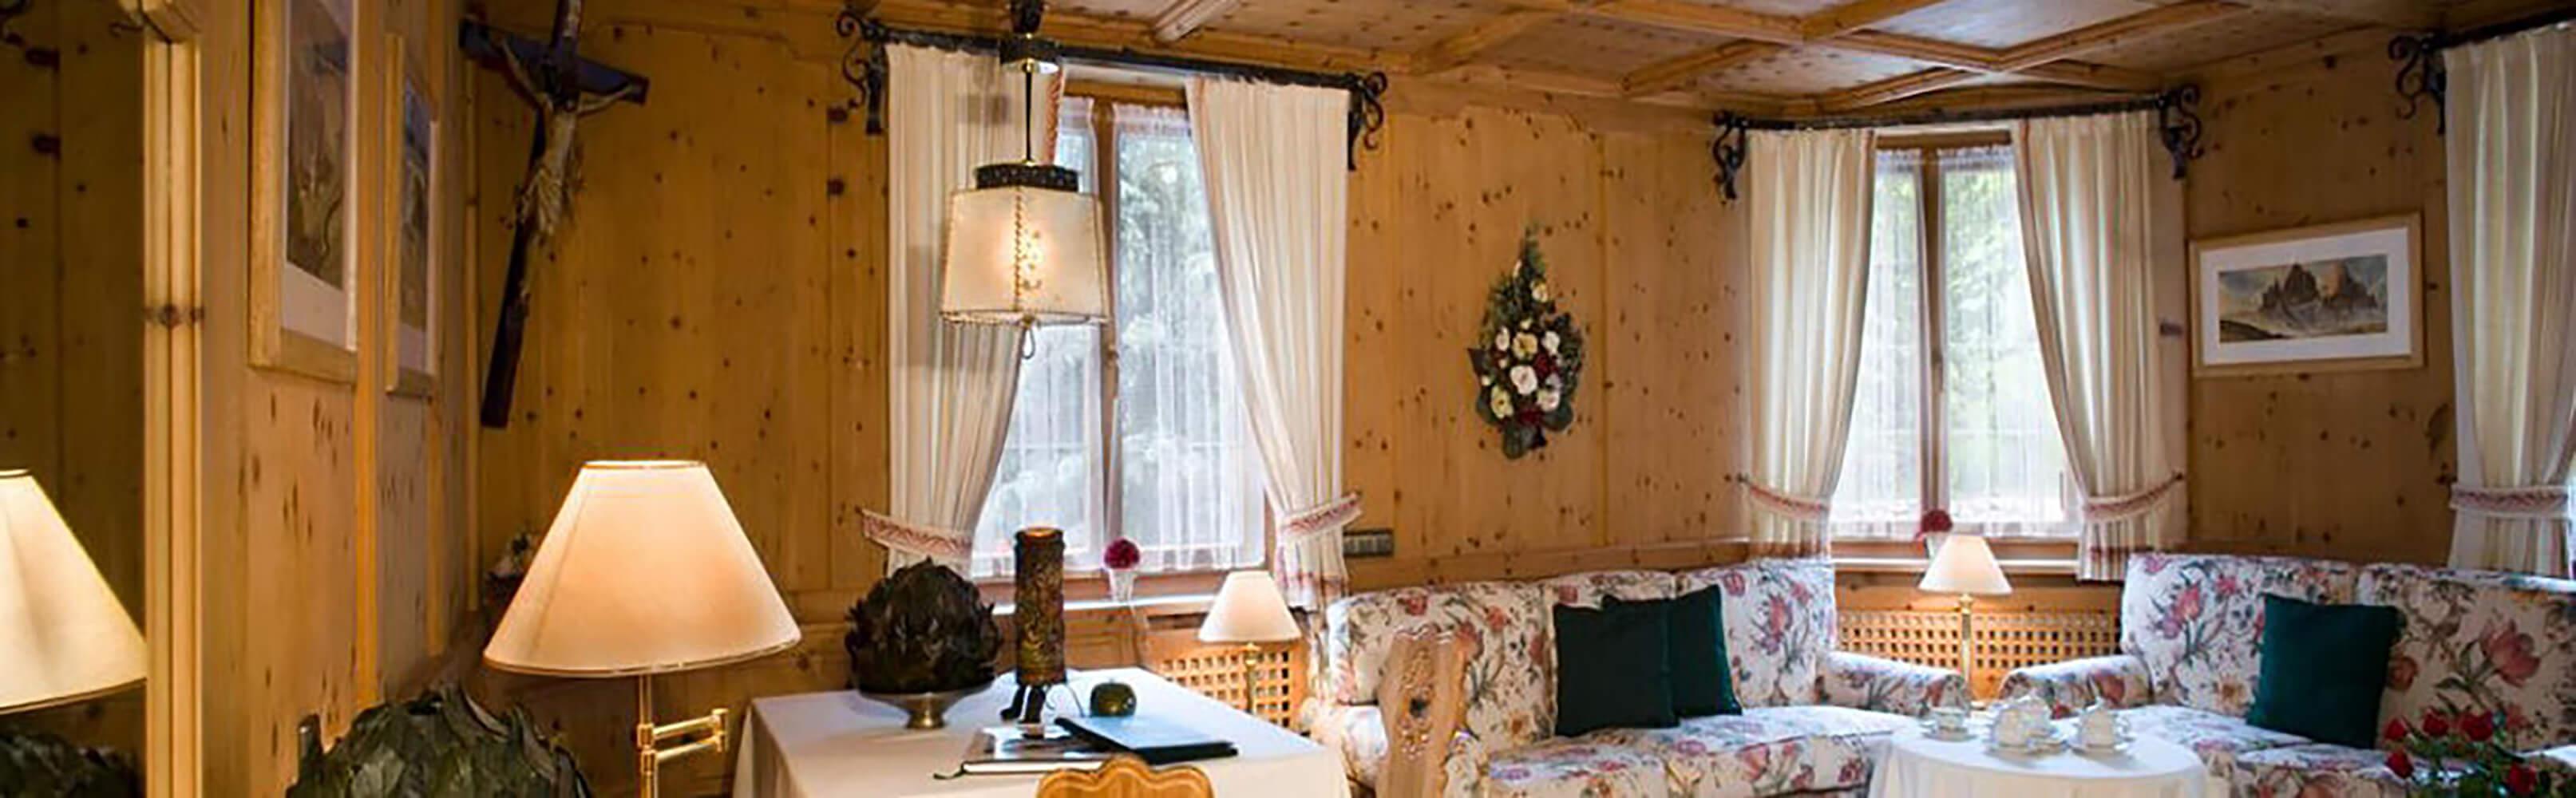 Hotel Sassongher ***** 1